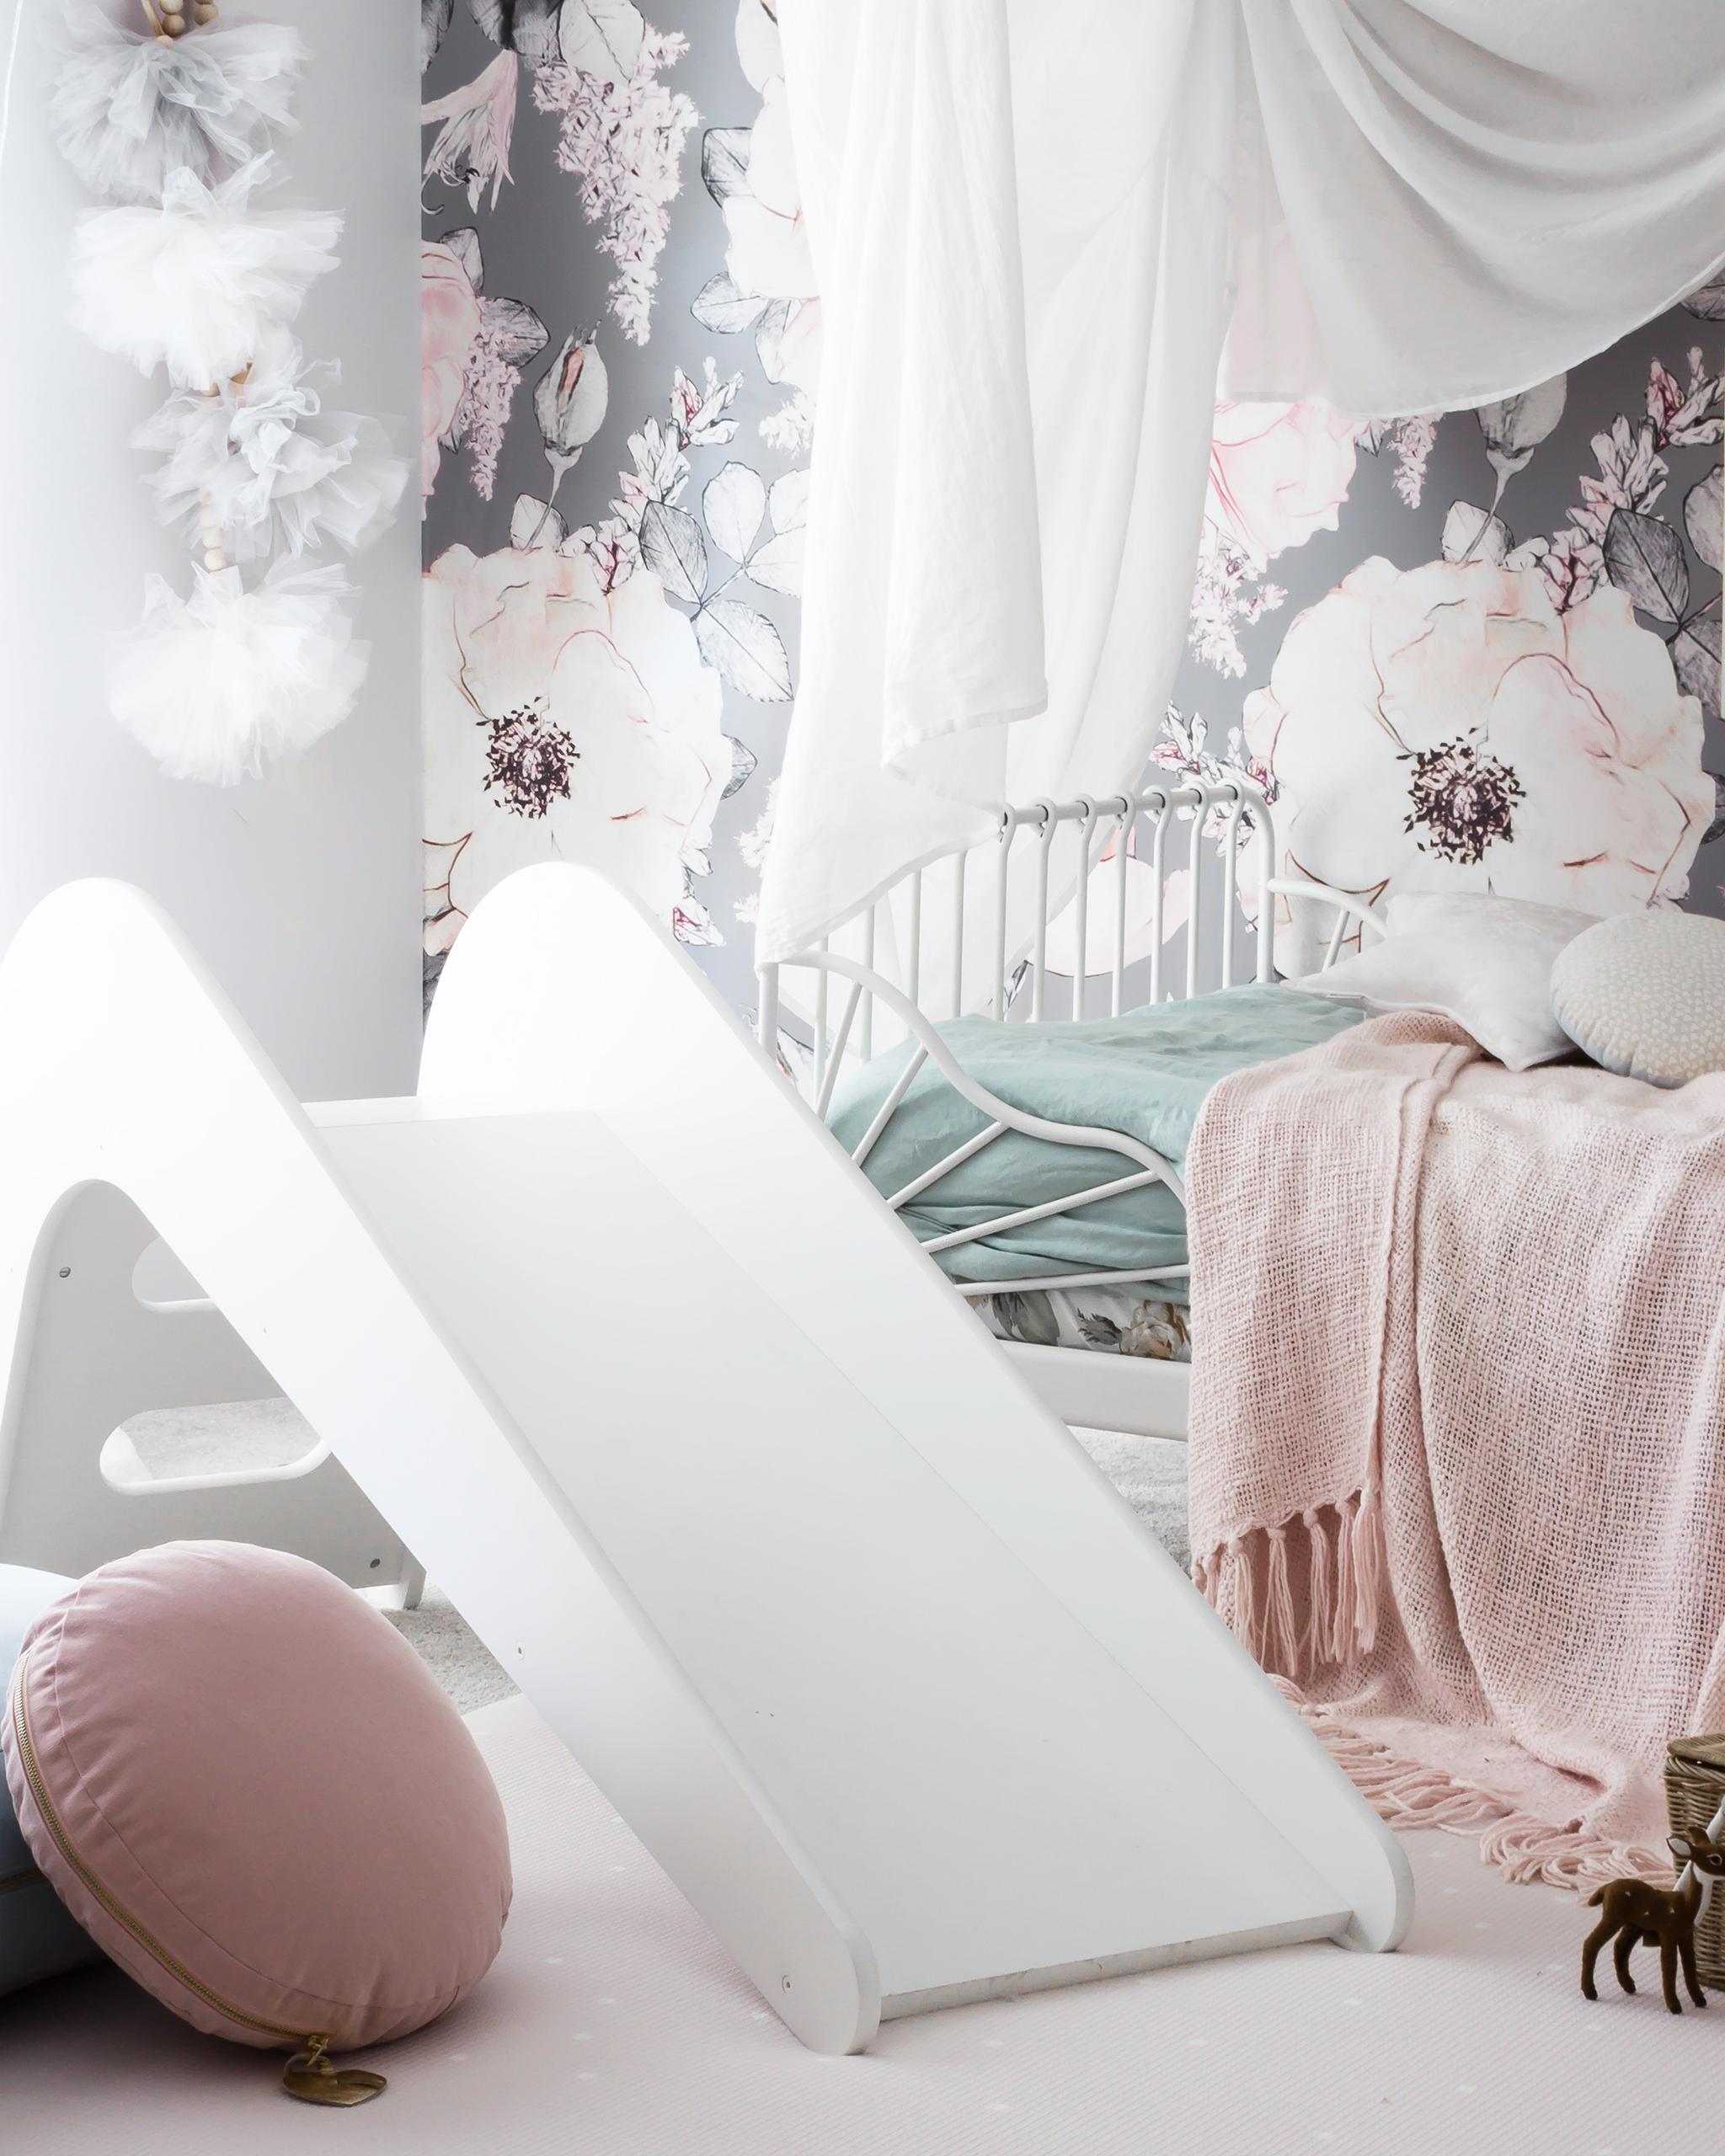 Floral Girl's Toddler Room with Slide